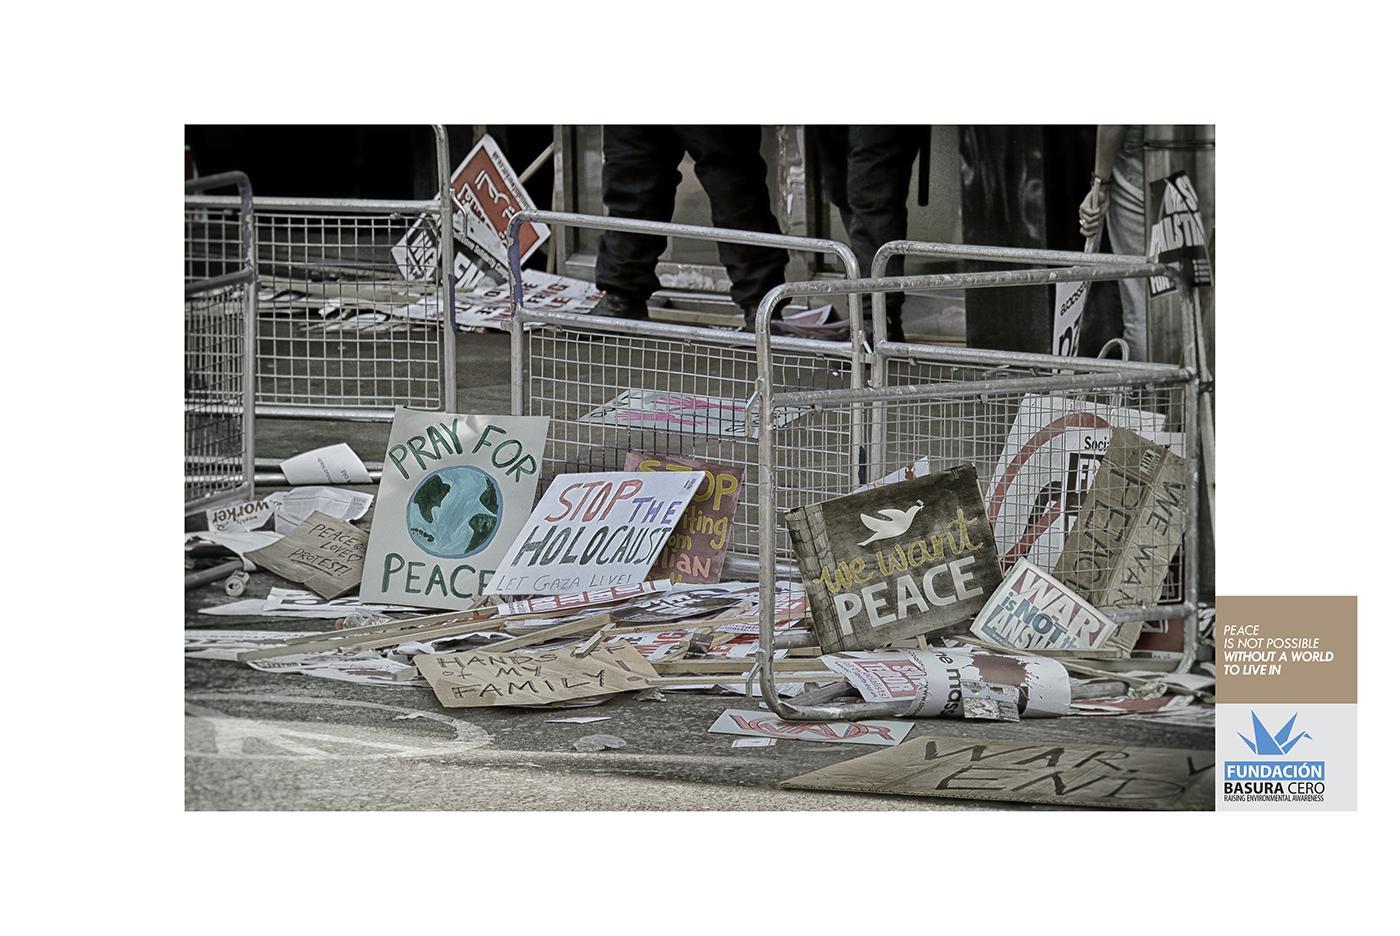 Fundacion Basura Print Ad - World without trash, 3